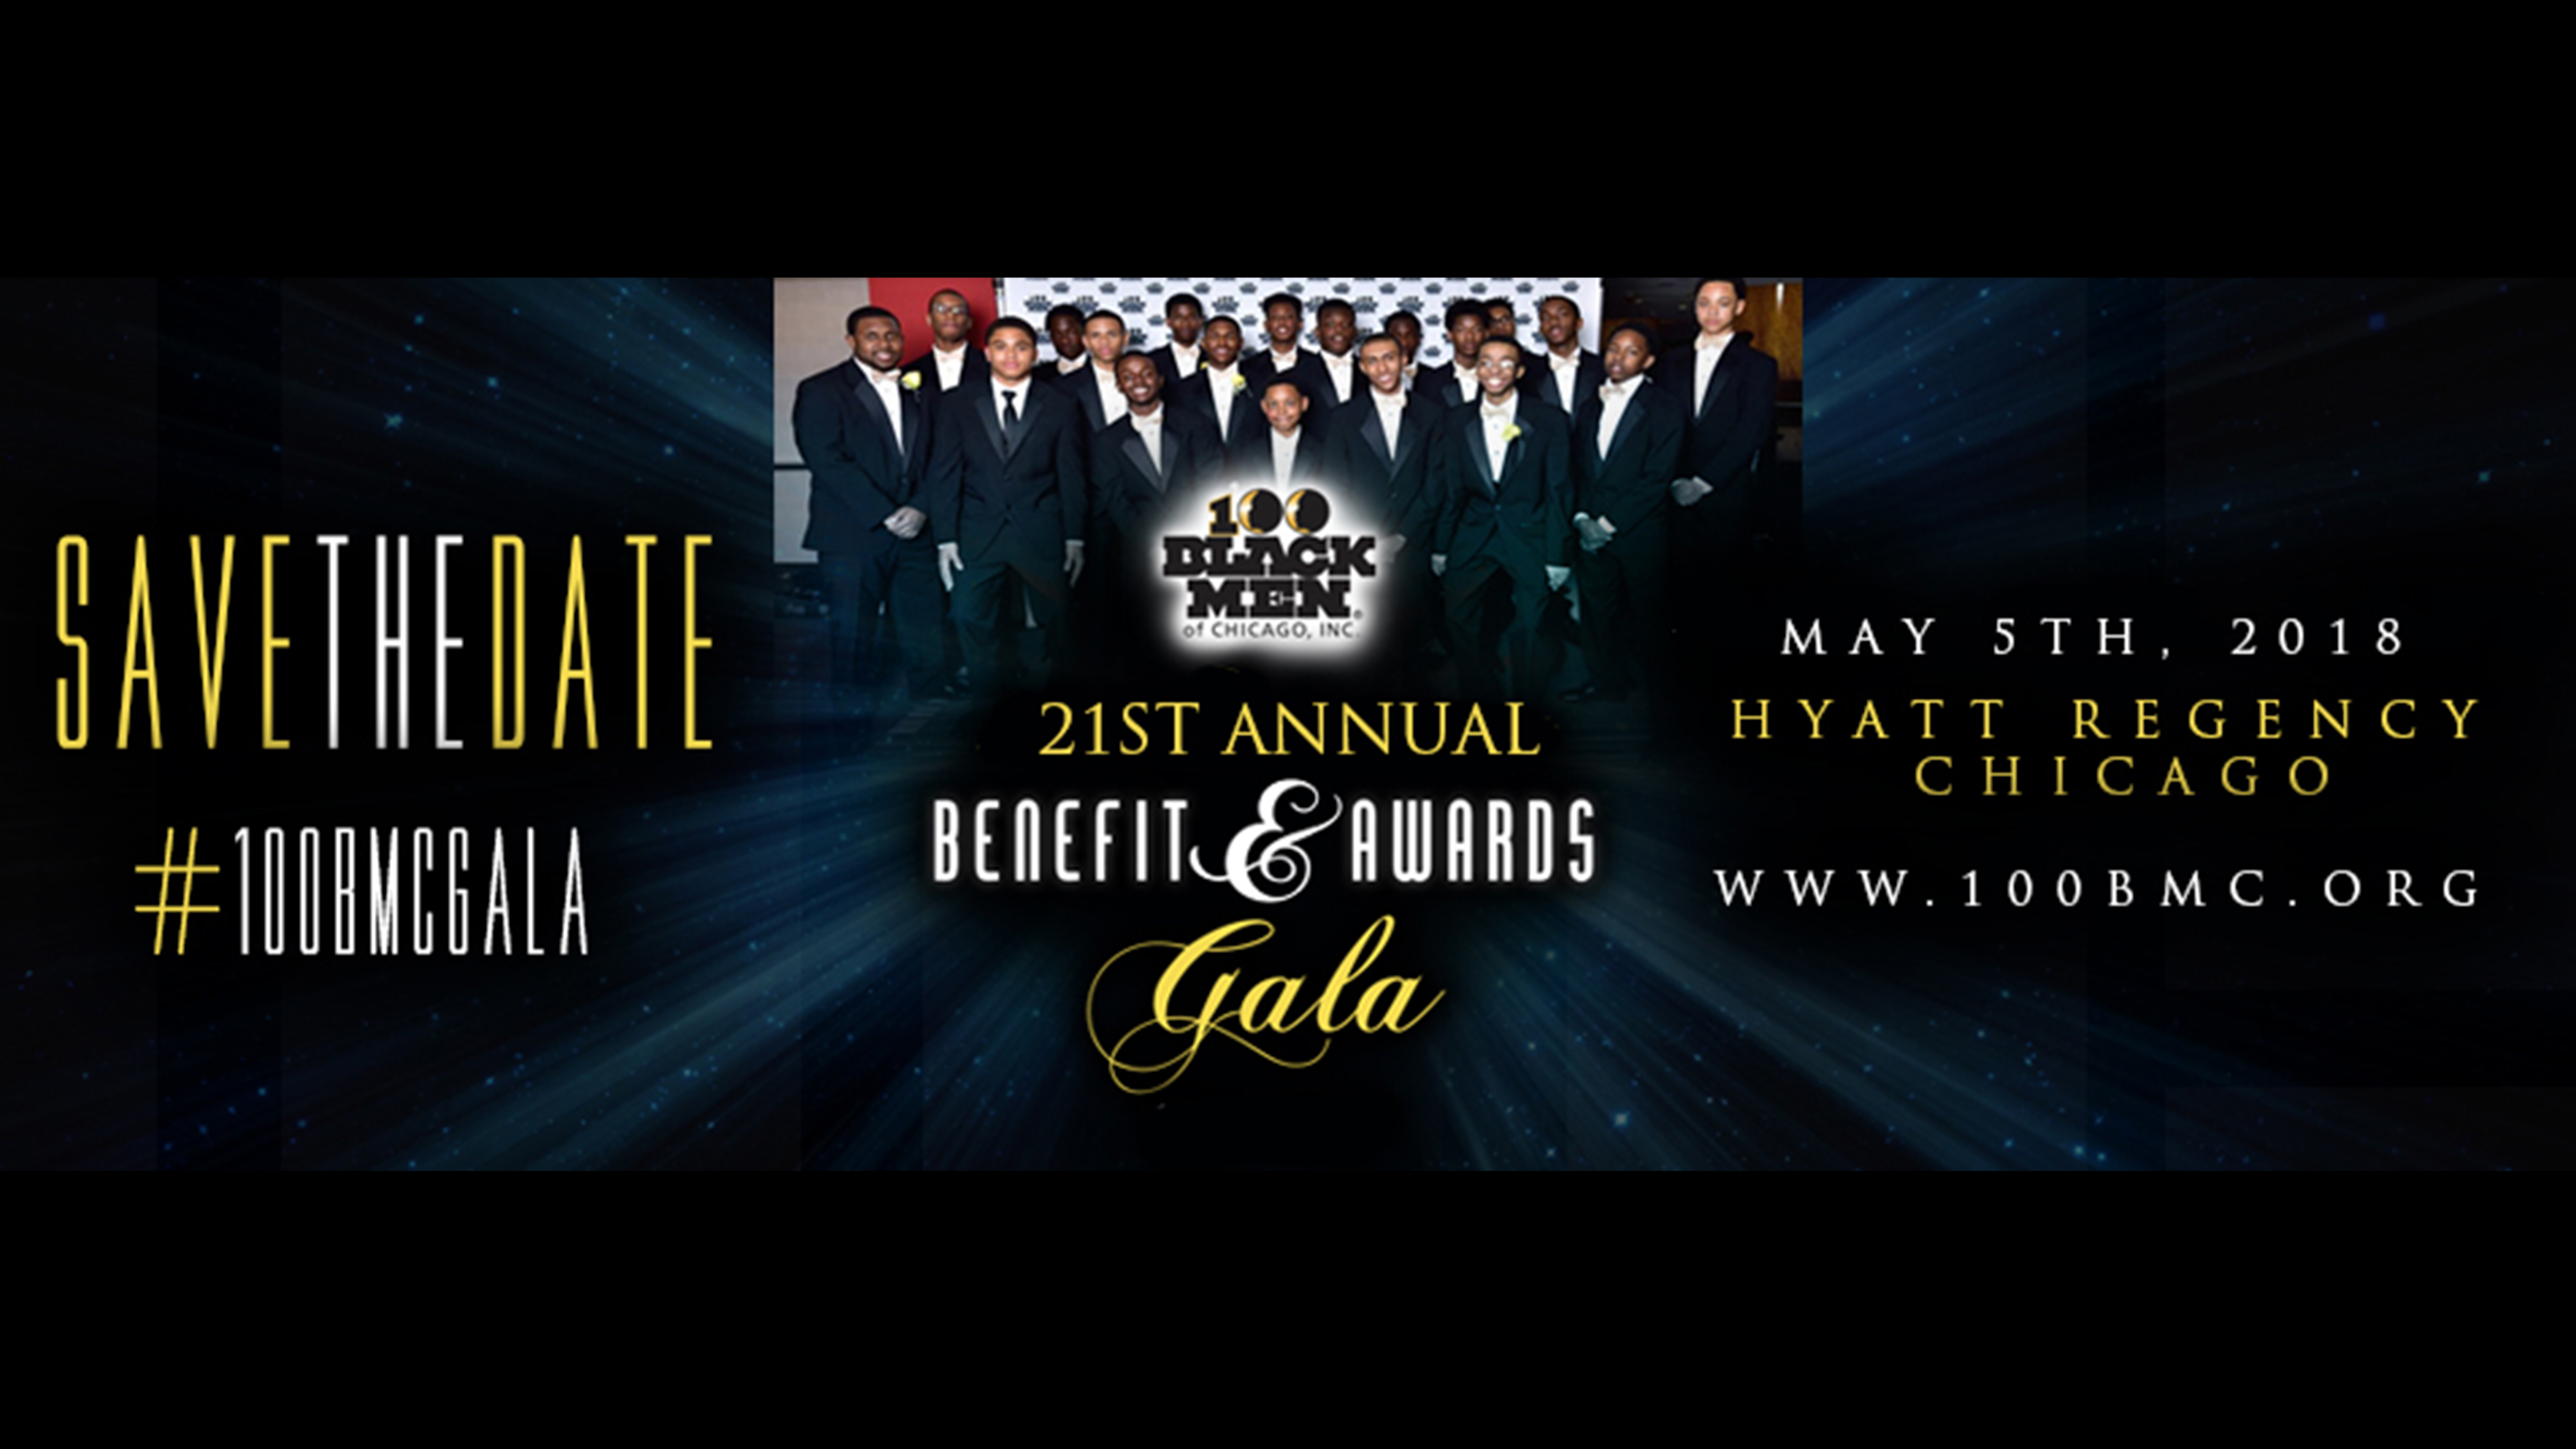 21st Annual Awards & Benefits Gala